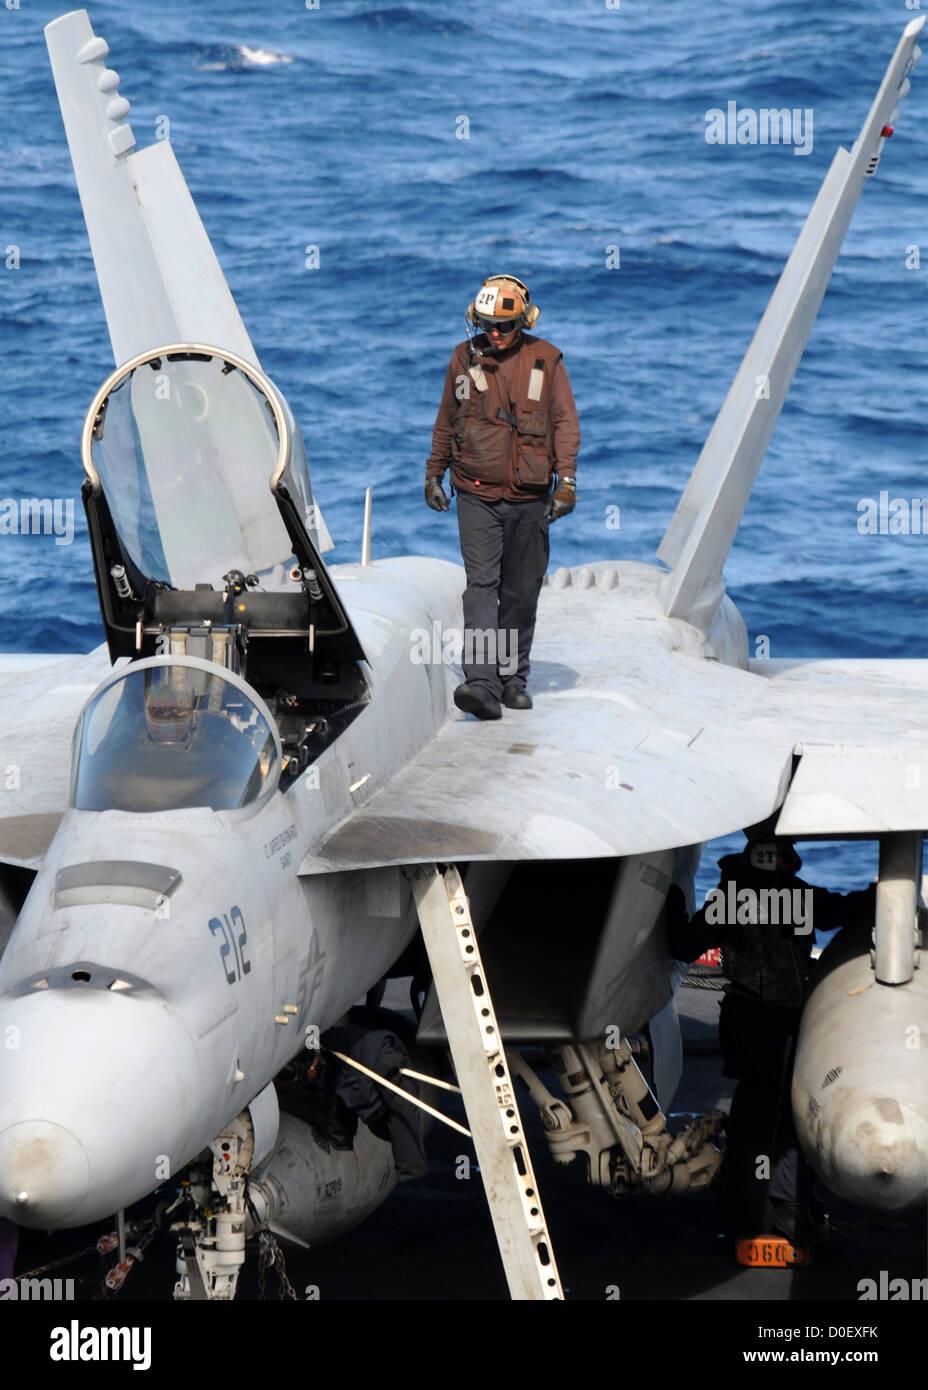 A flight deck captain does checks on an F/A-18E Super Hornet on the flight deck of the aircraft carrier USS Nimitz - Stock Image